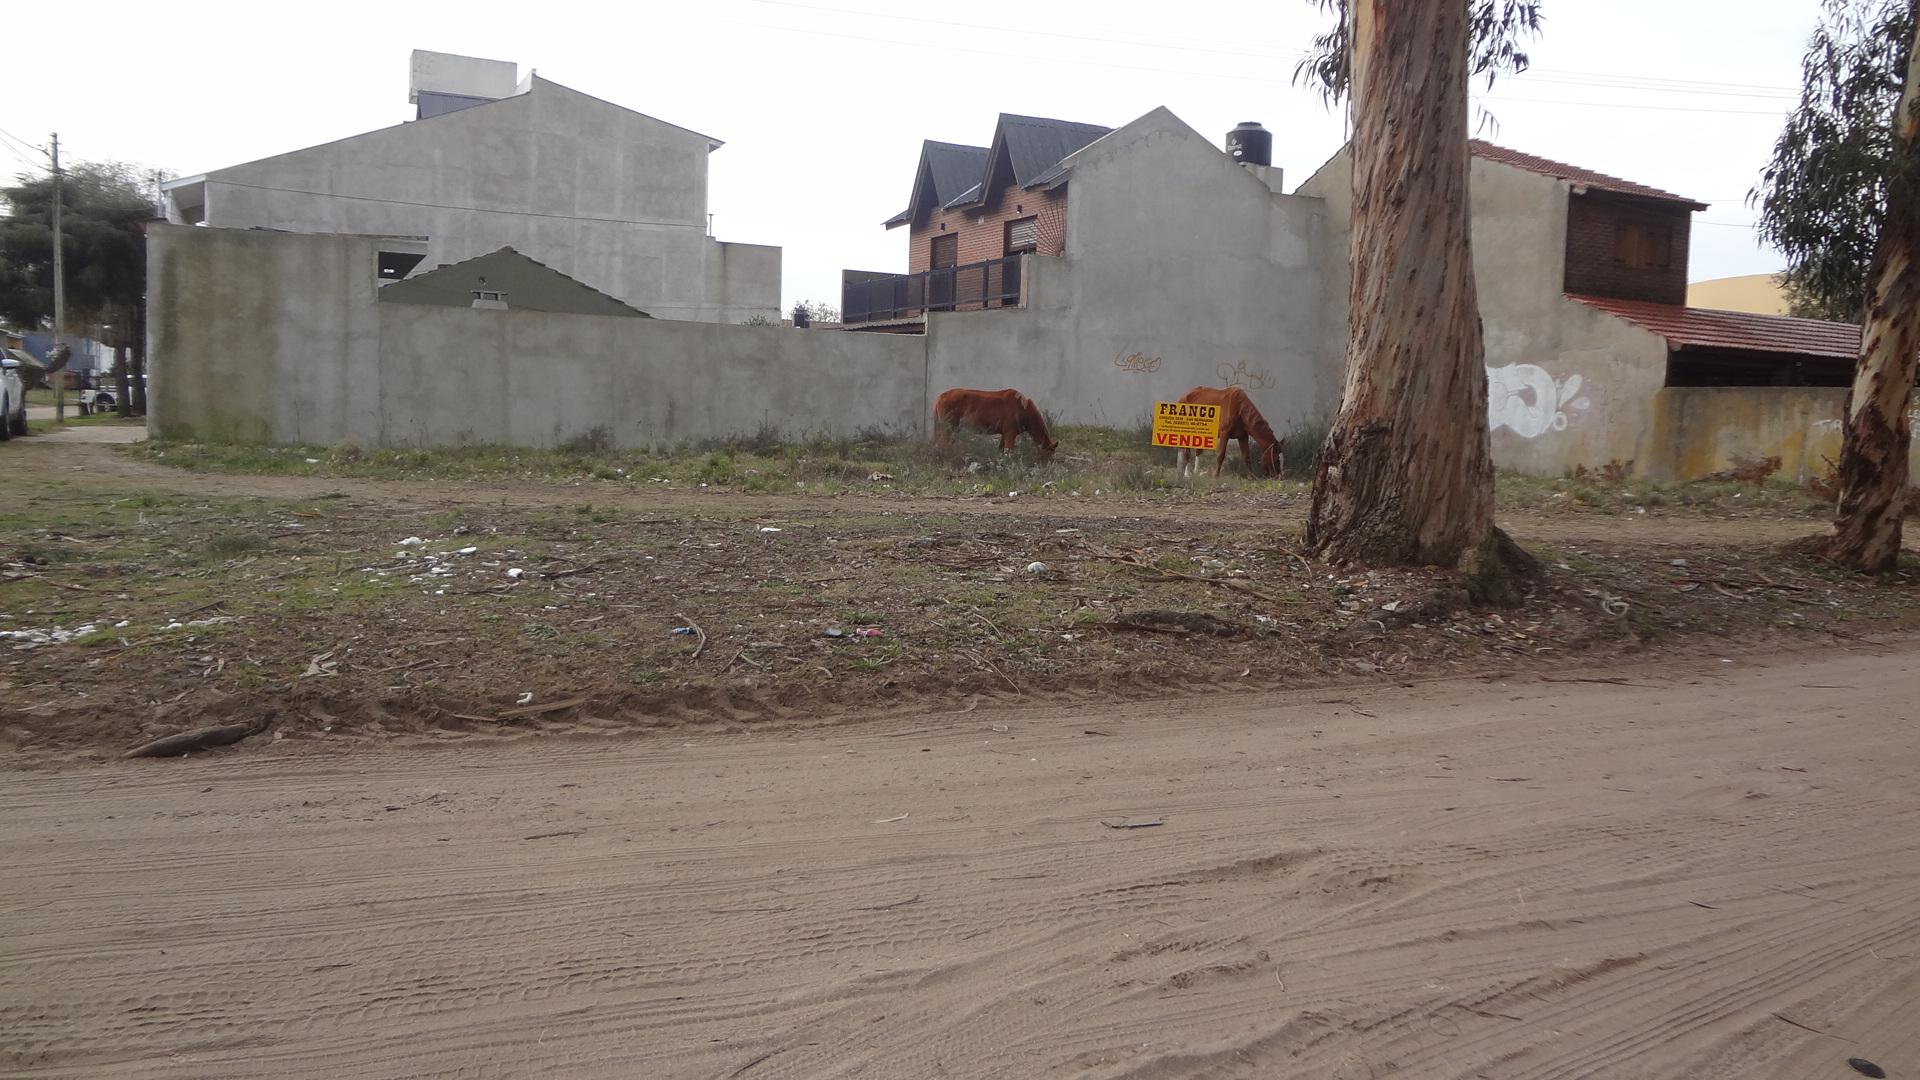 ID 171 SAN BERNARDO LOTE BALDIO SALTA Y STROBEL